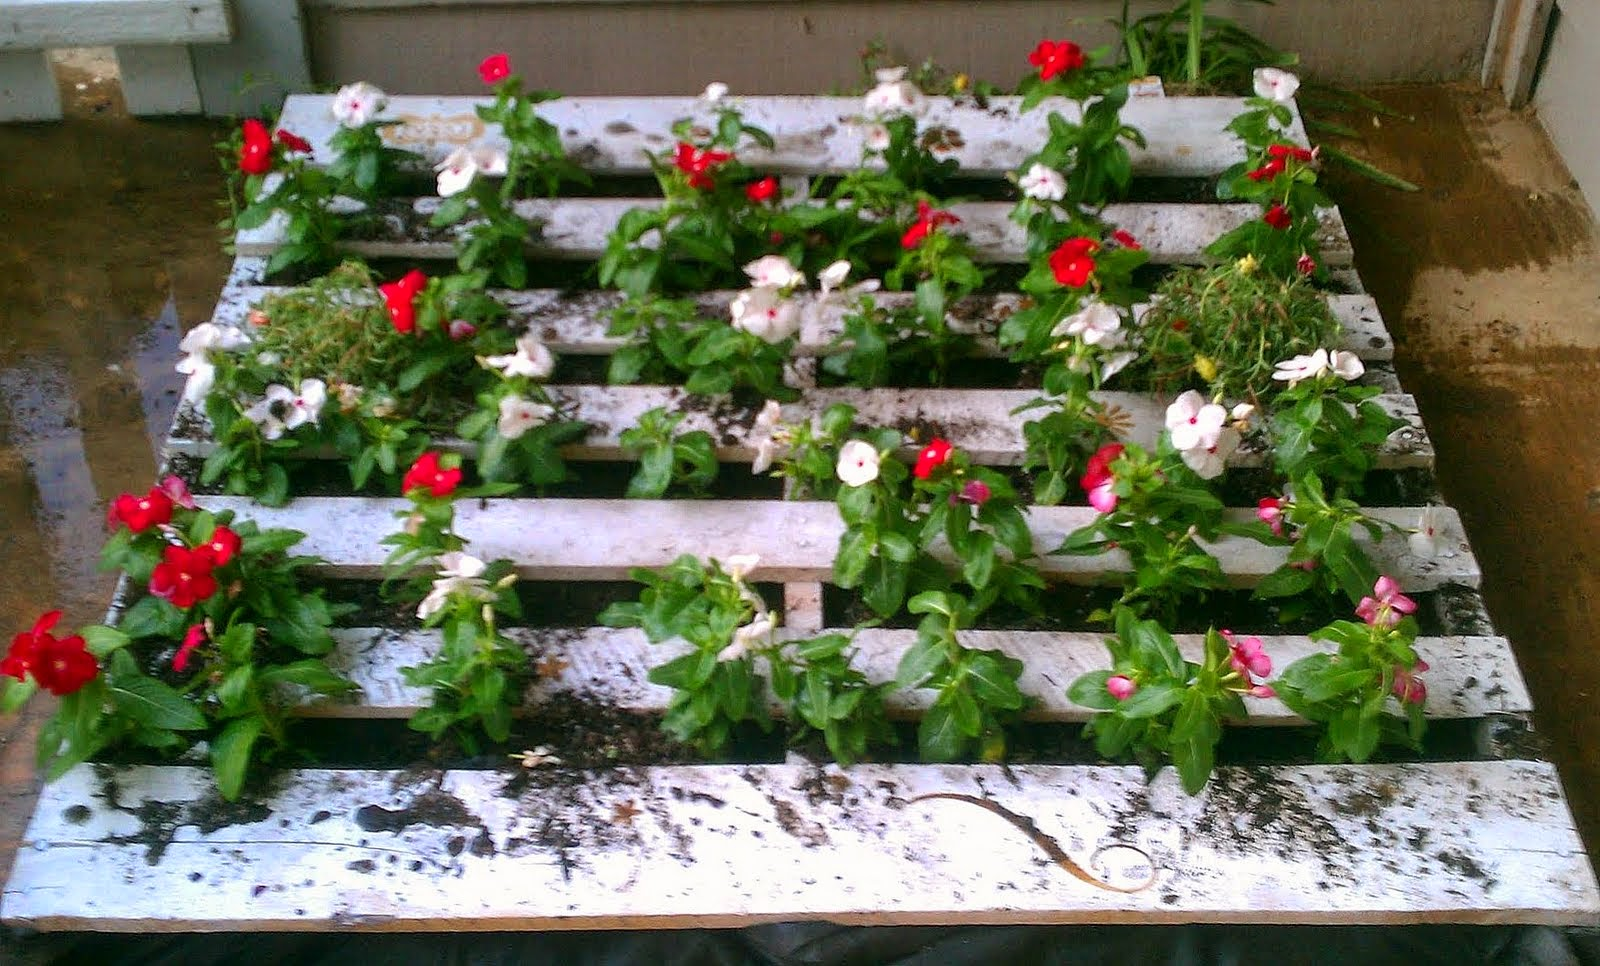 Zigzagzon jardines verticales con palets - Jardines verticales con palets ...